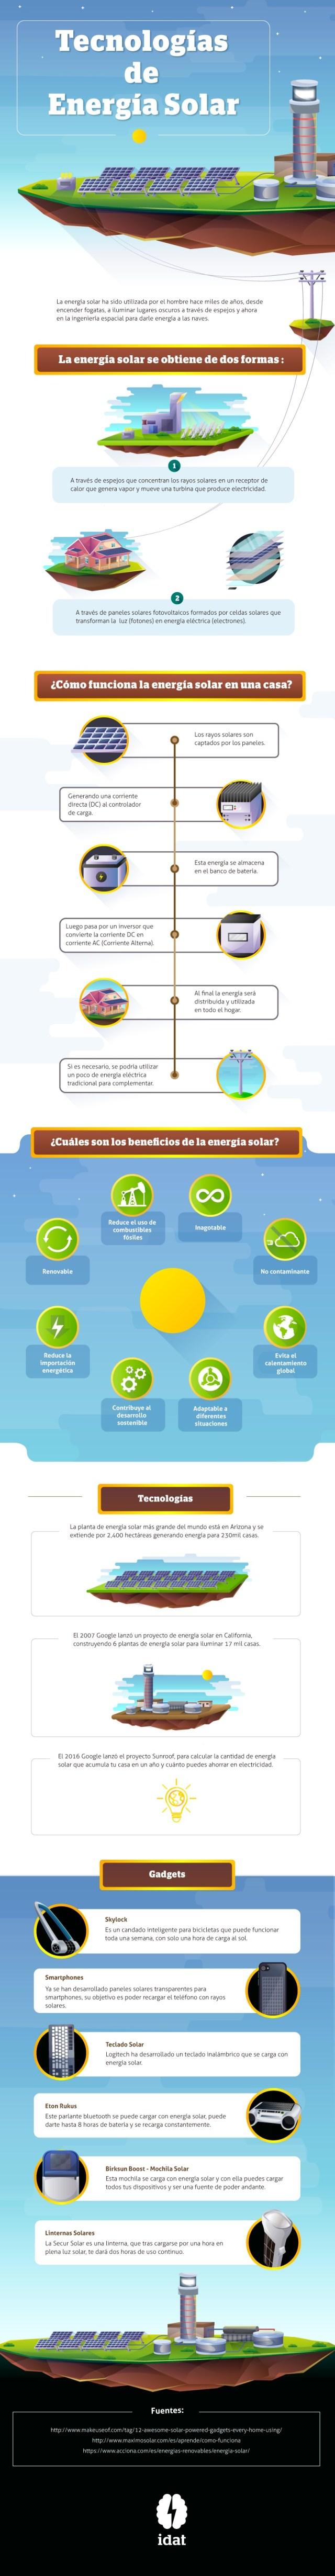 Infografia-Tenologias-EnergiaSolar.jpg